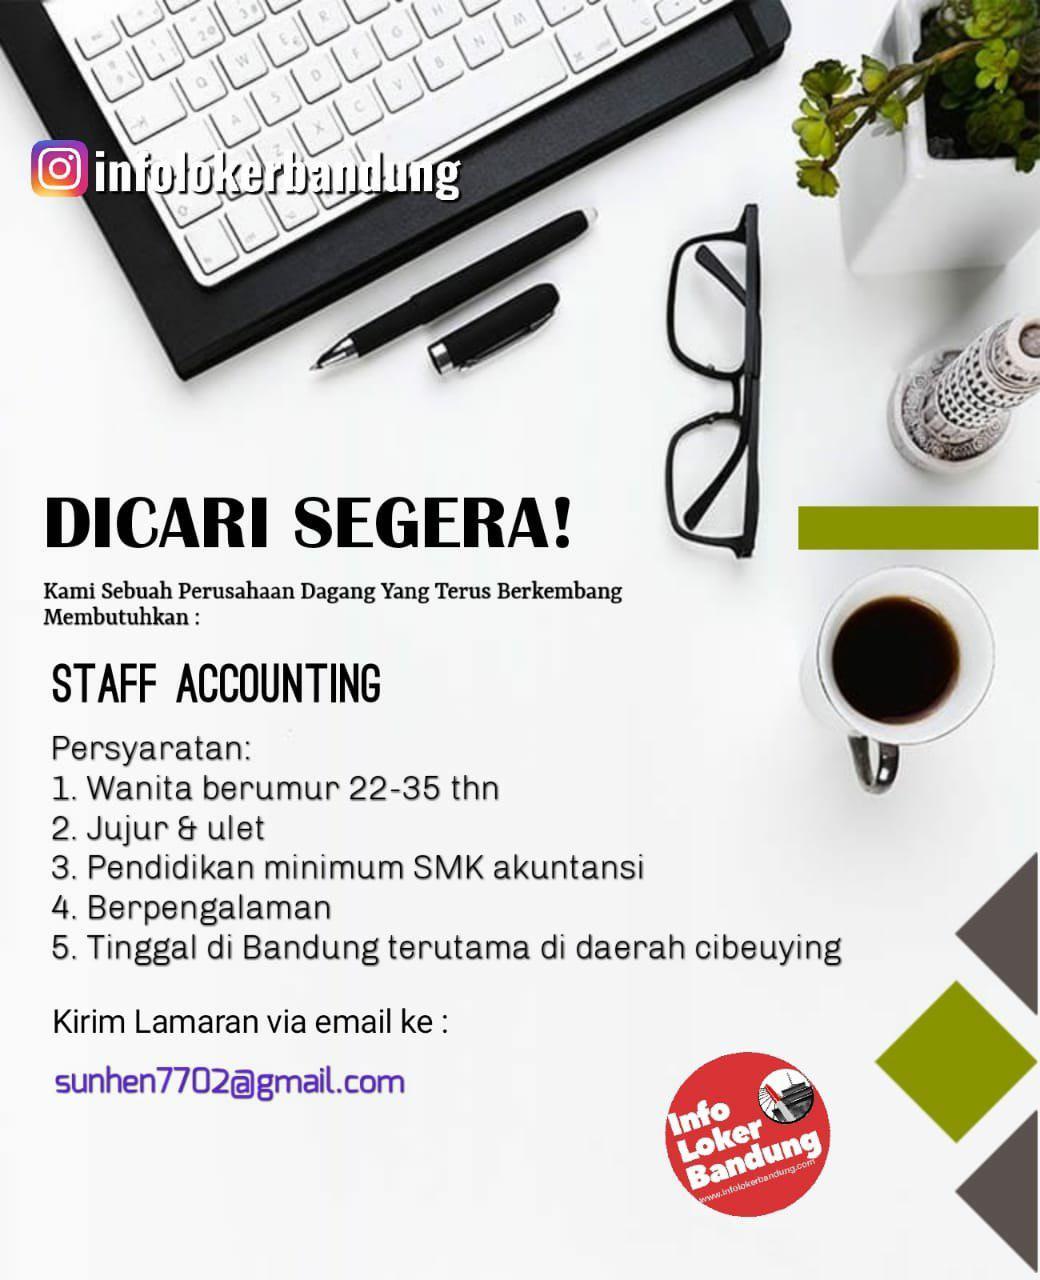 Lowongan Kerja Staff Accounting Bandung Oktober 2019